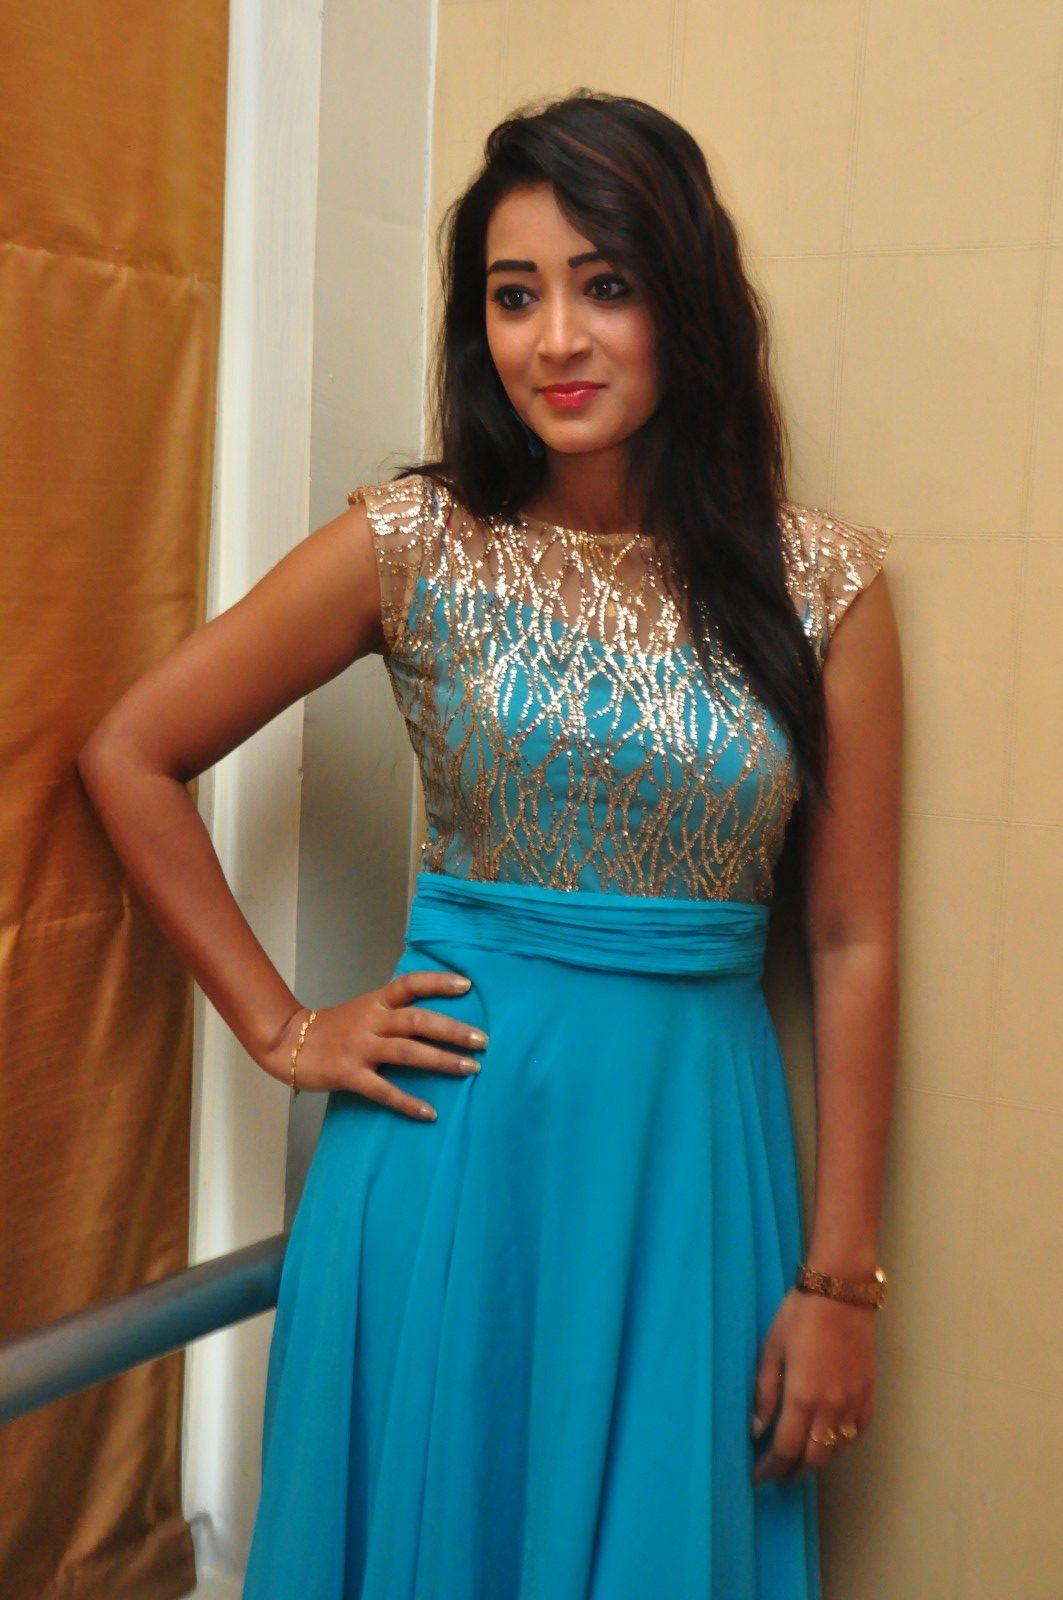 Bhanu tripathi blue dress figure slideshow